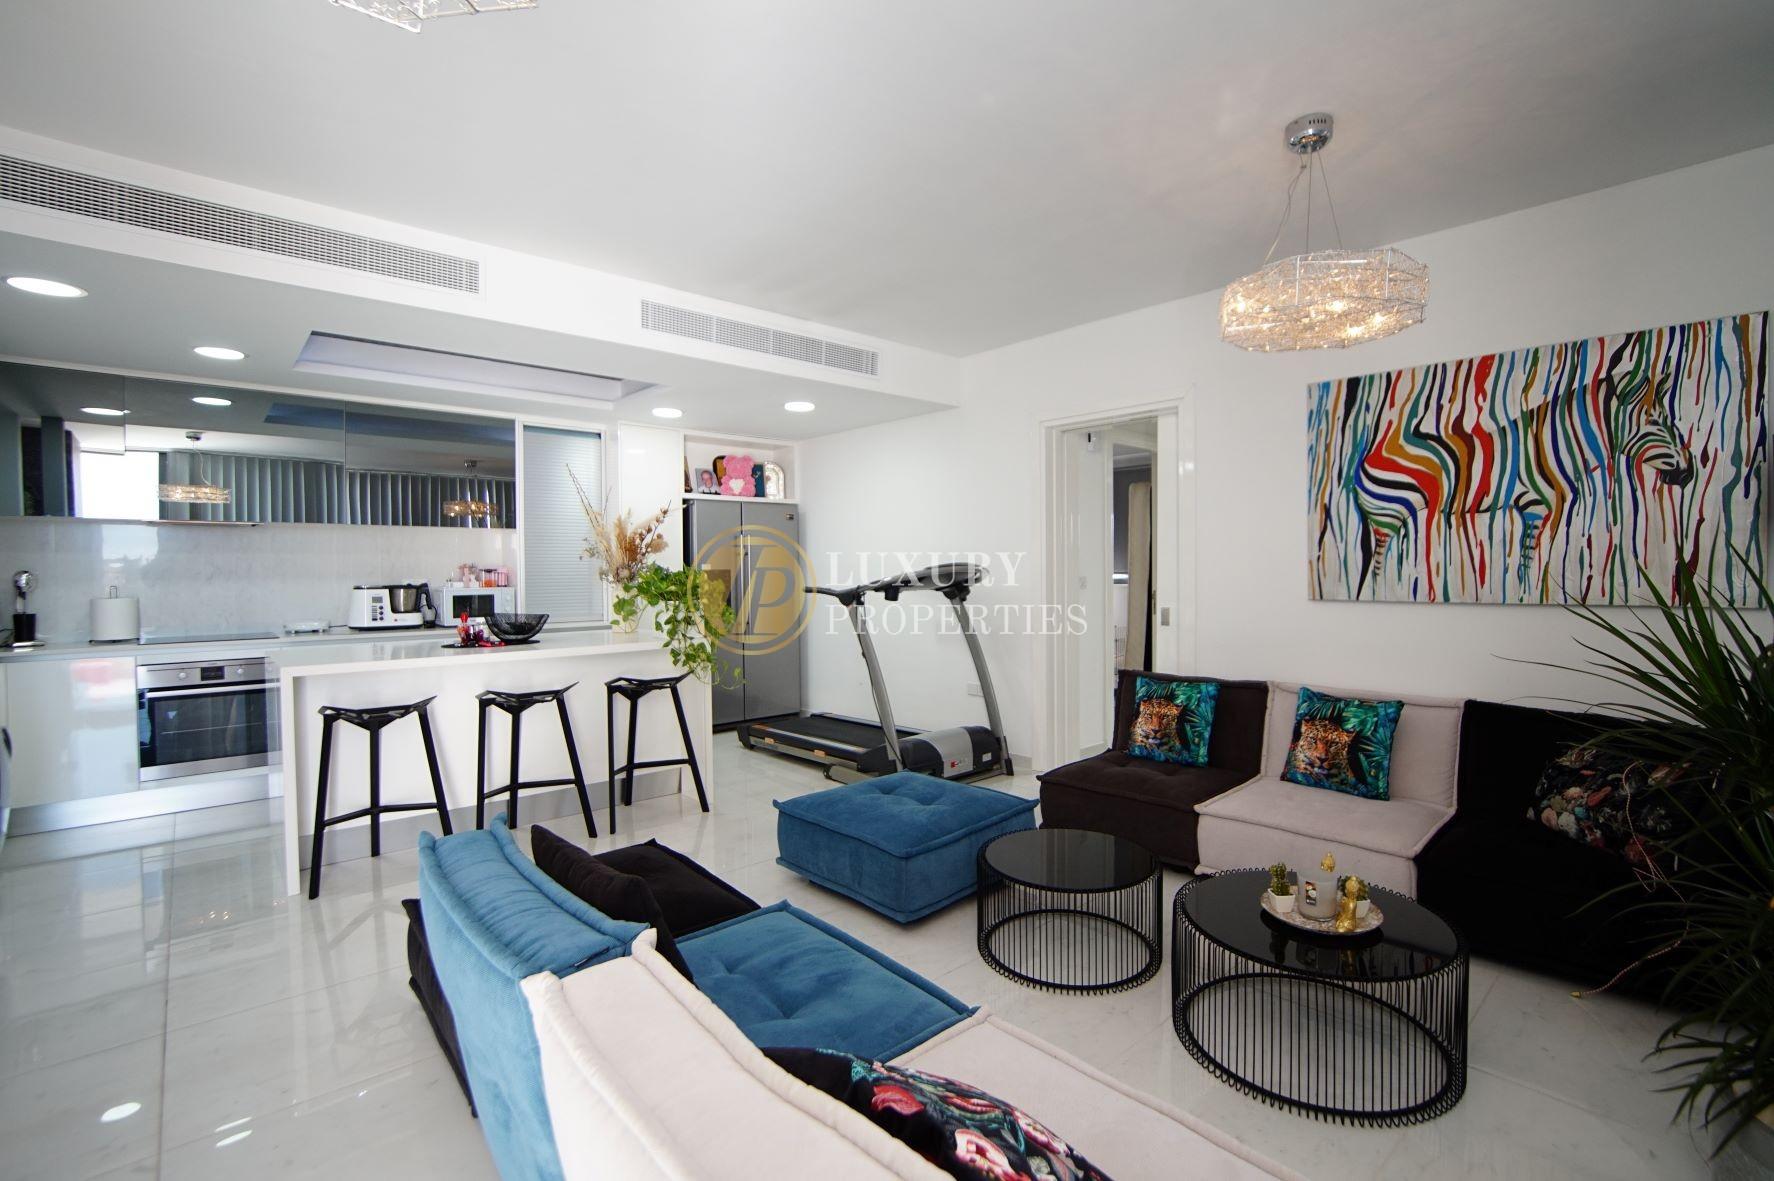 2 bedroom modern apartment in Egkomi for sale